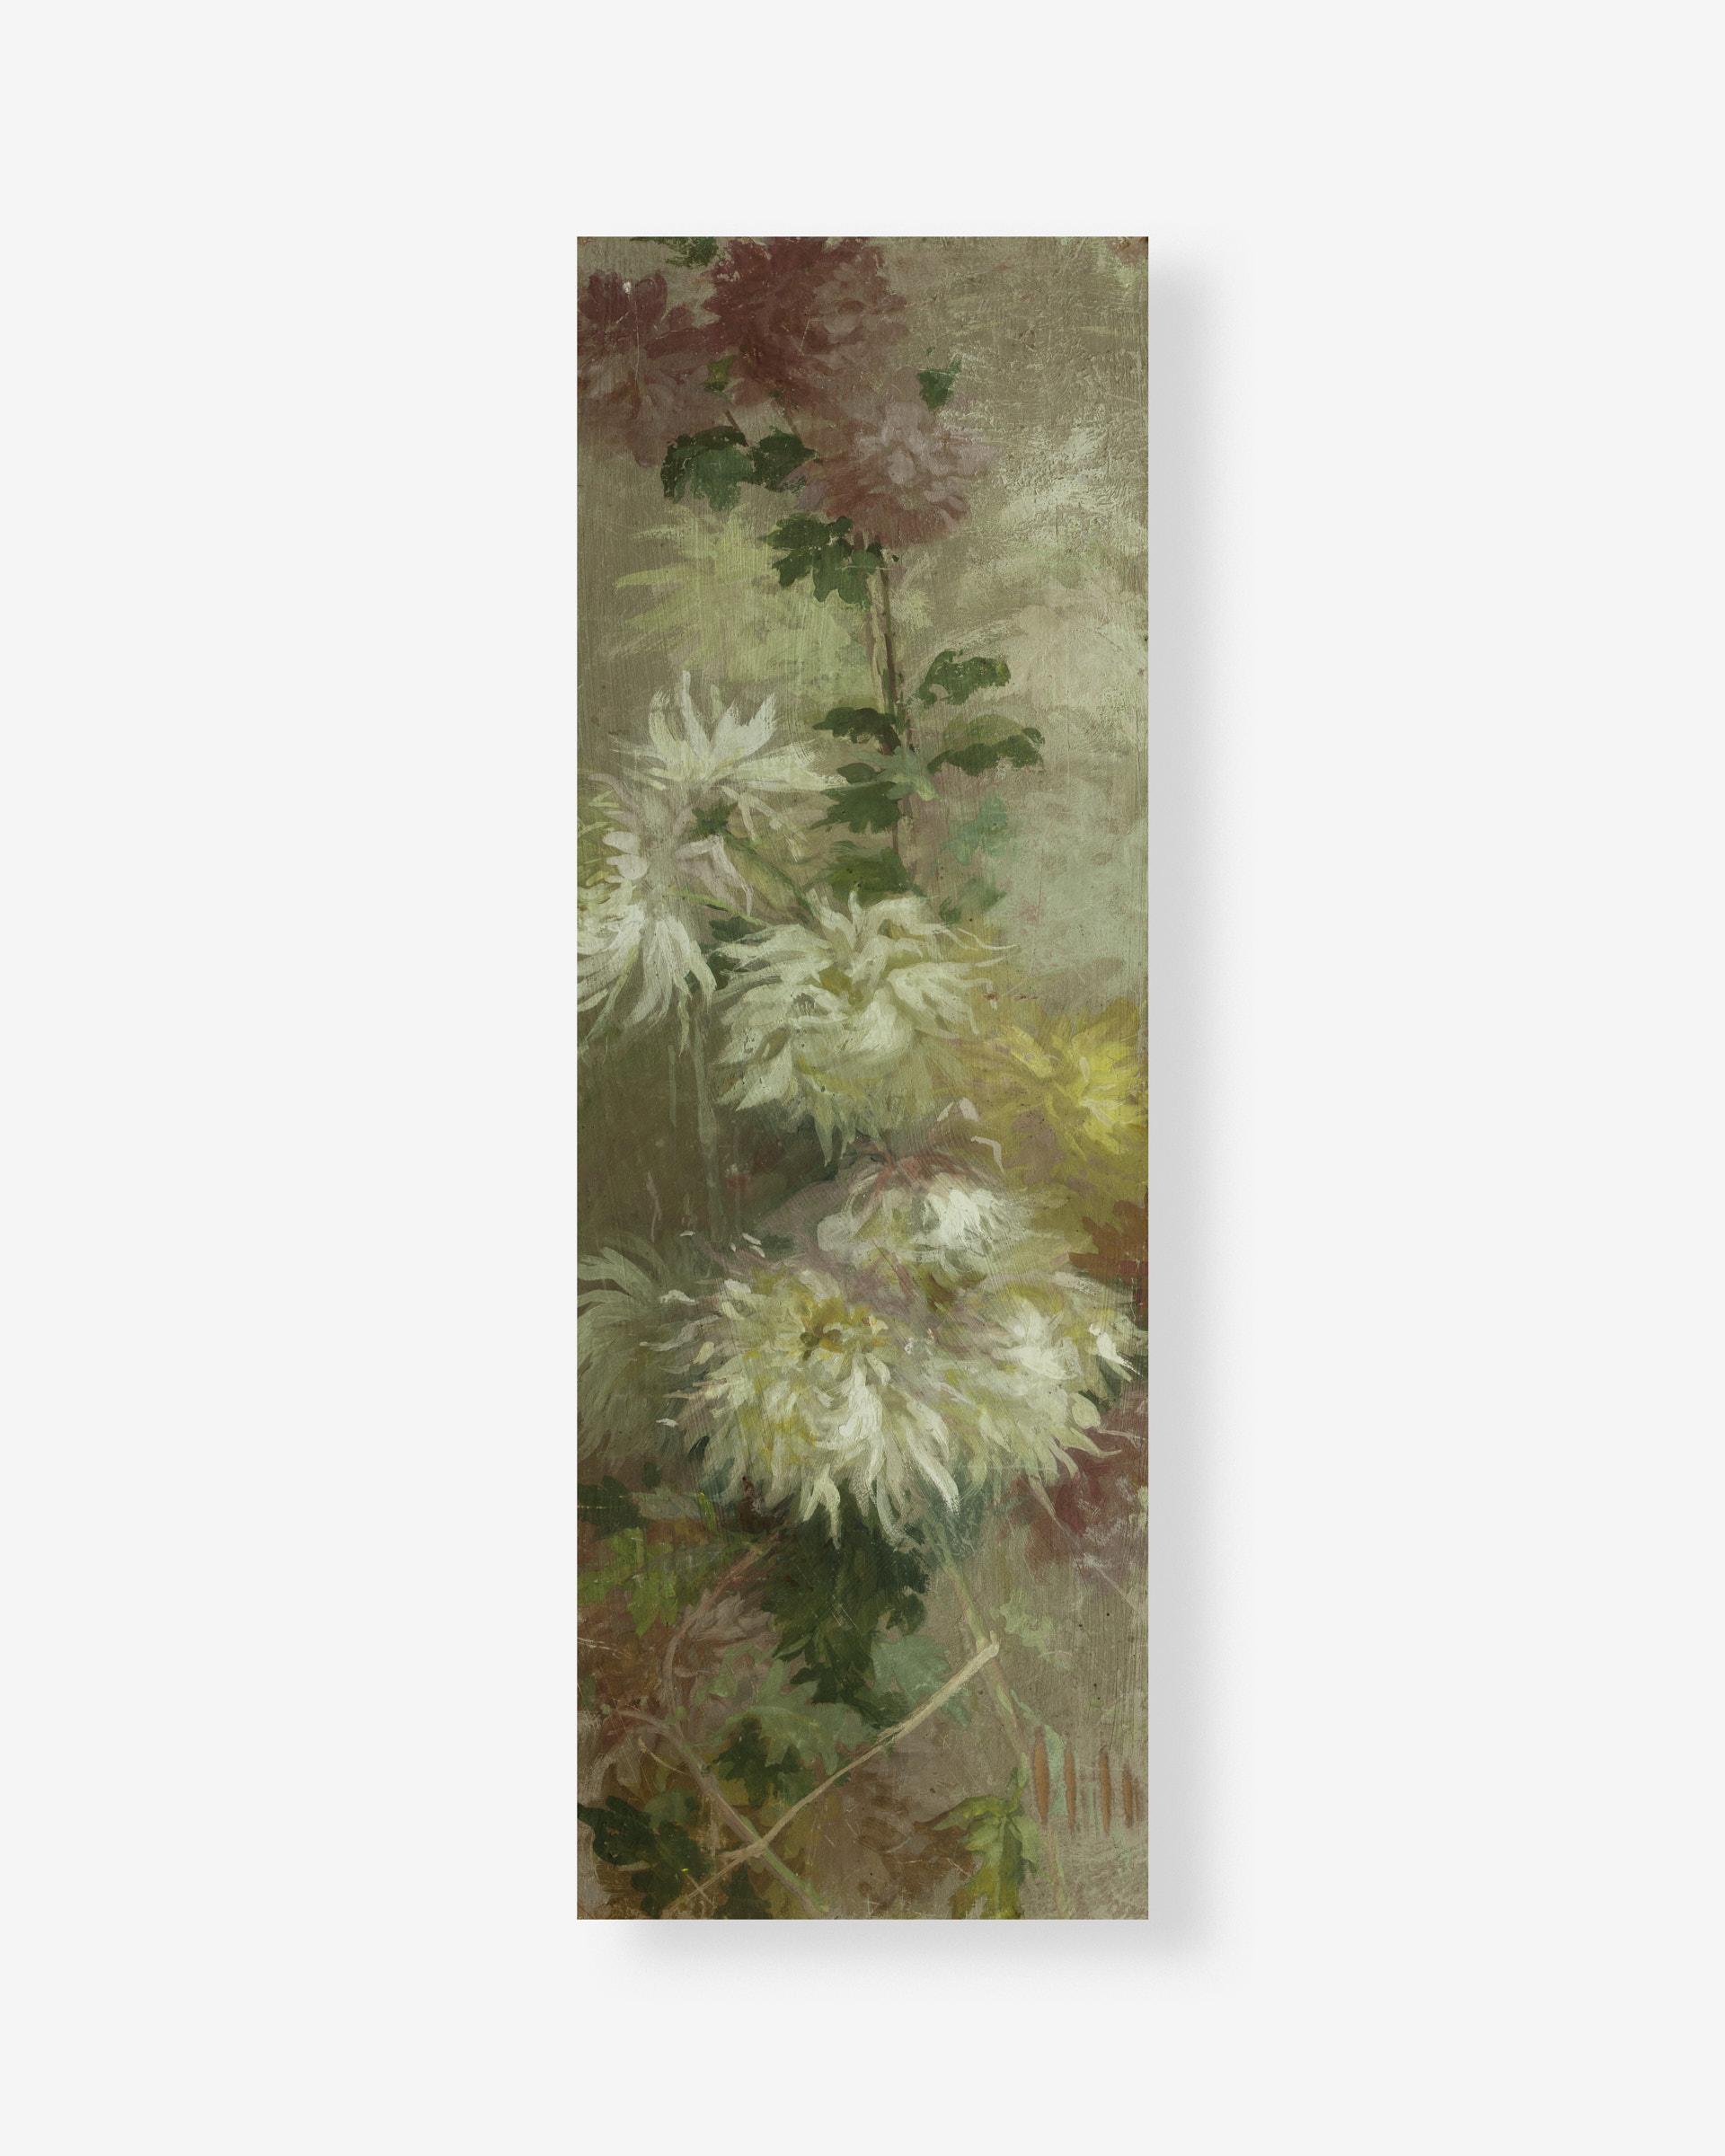 Attilio-Trentini_Attilio-Trentini_Galleria-Faraci-Arte_Verona-1